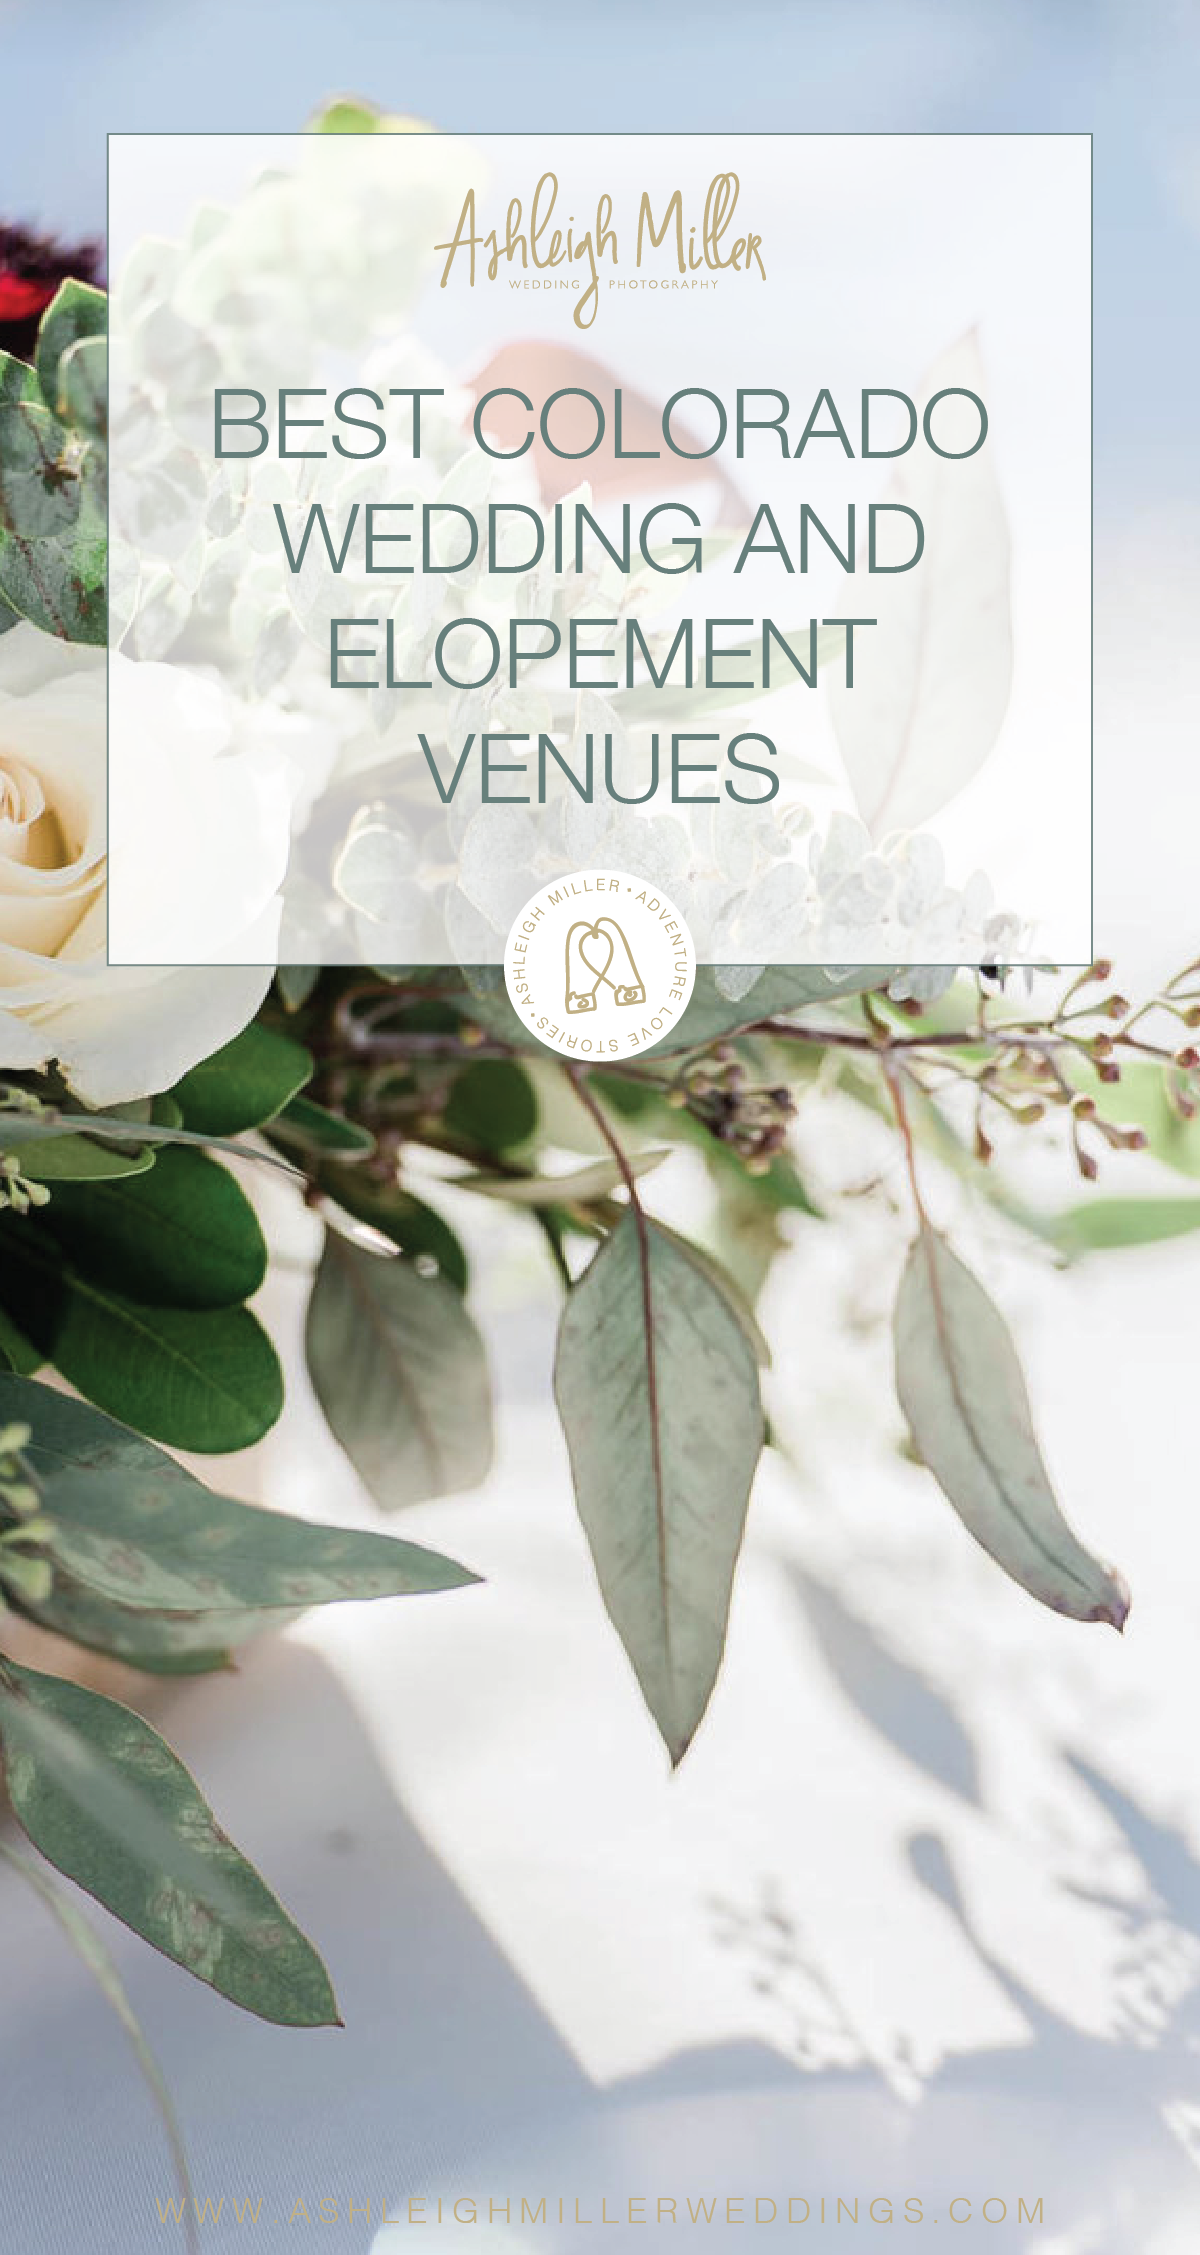 Best-Colorado-Wedding-and-Elopement-Venues-01.png